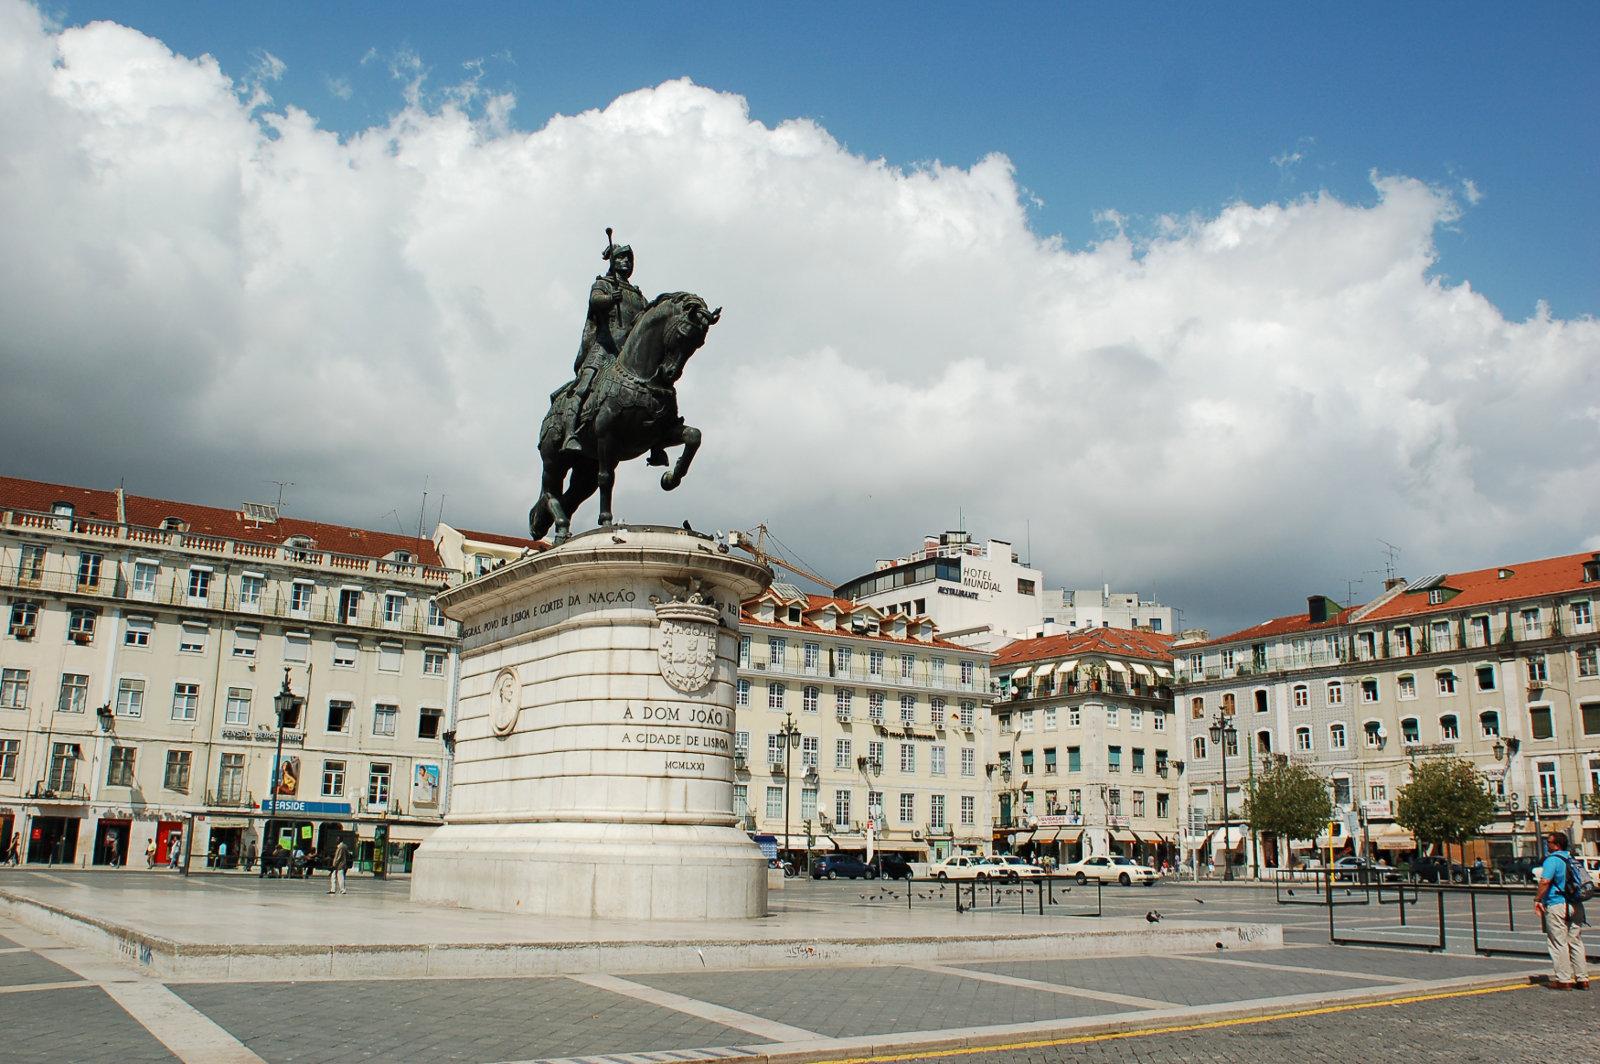 King John Statue